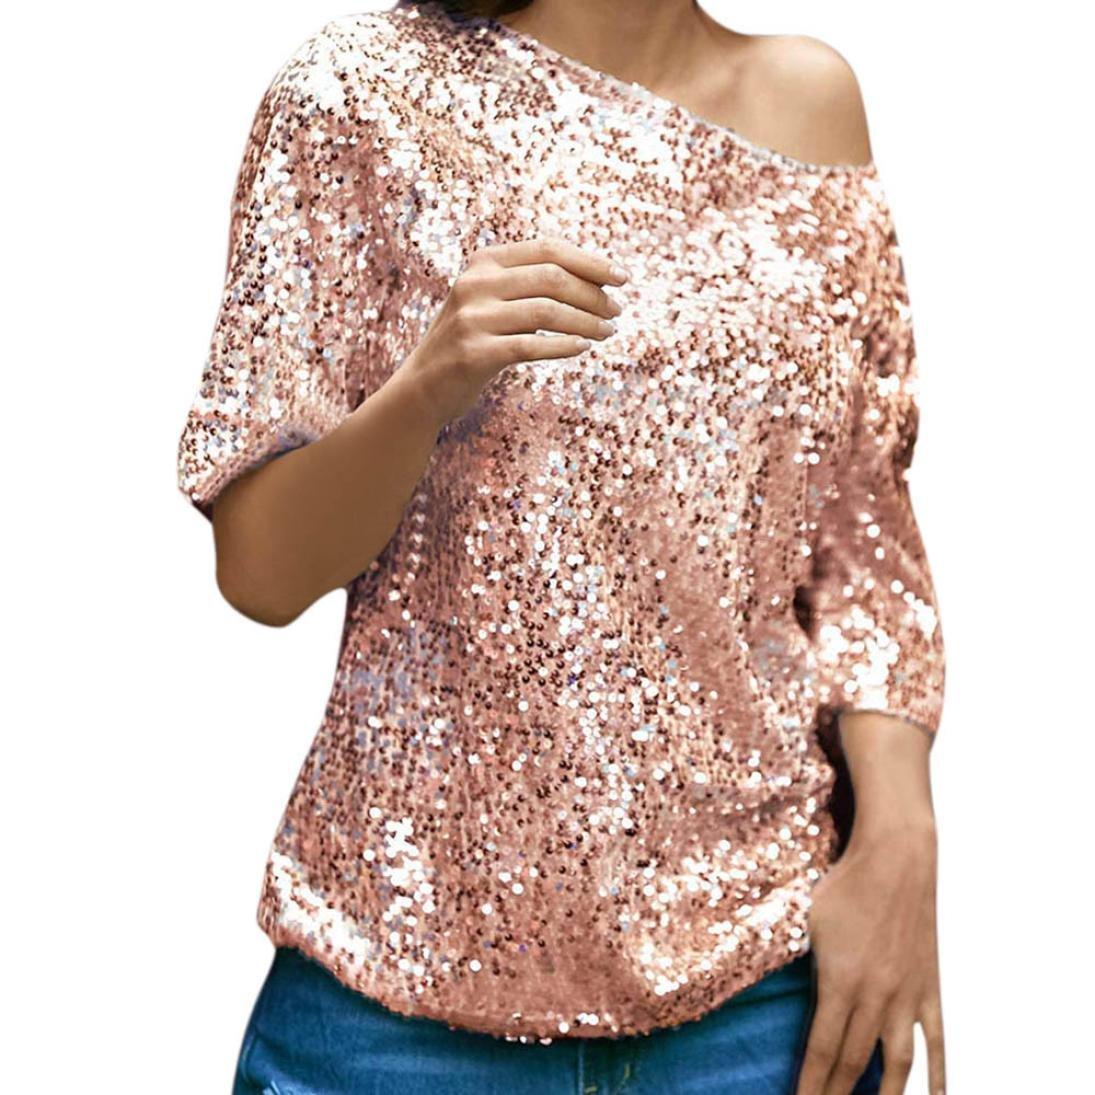 Fheaven Womens Sequins Sparkle Half Sleeve Oblique Casual Party Top T-Shirt Blouse (XL, Pink)